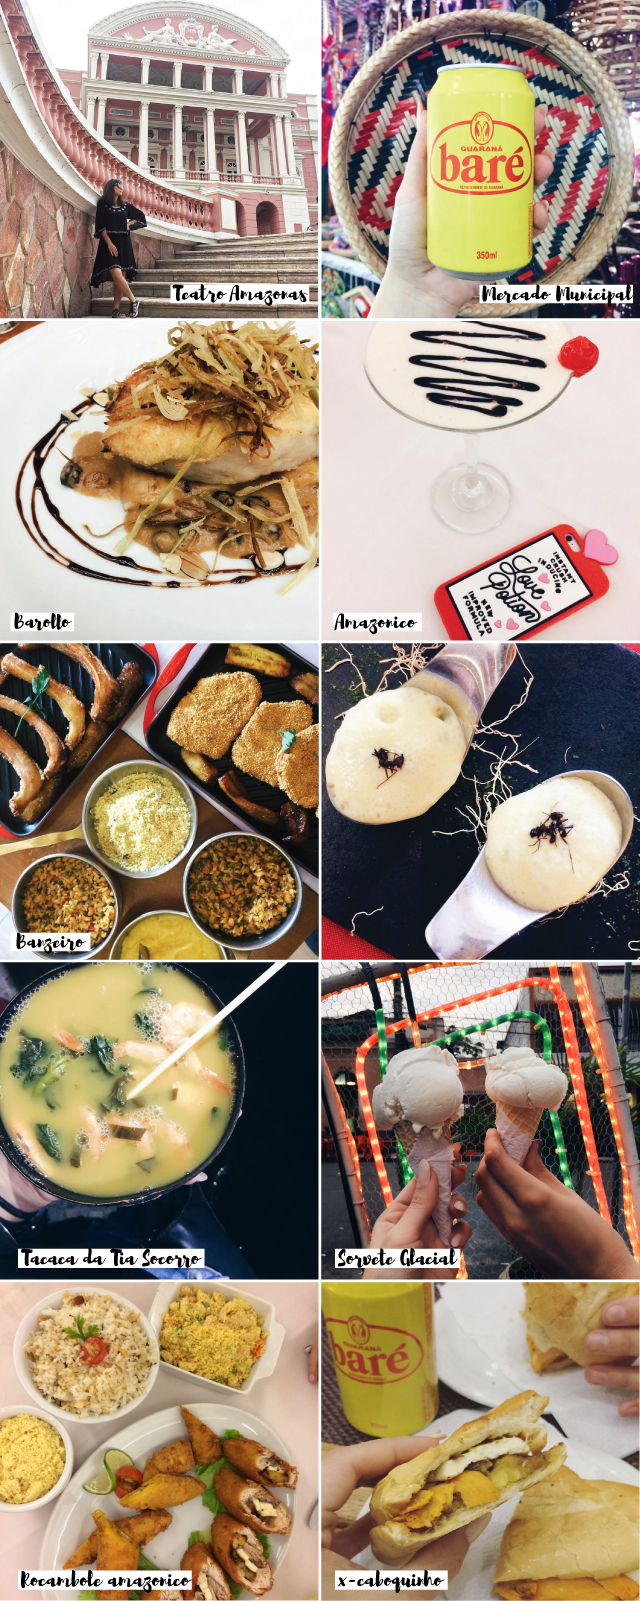 amazonia-dica-viagem-amazonas-manaus-restaurante-passeio-blog-onde-comer-rio-negro-solimoes